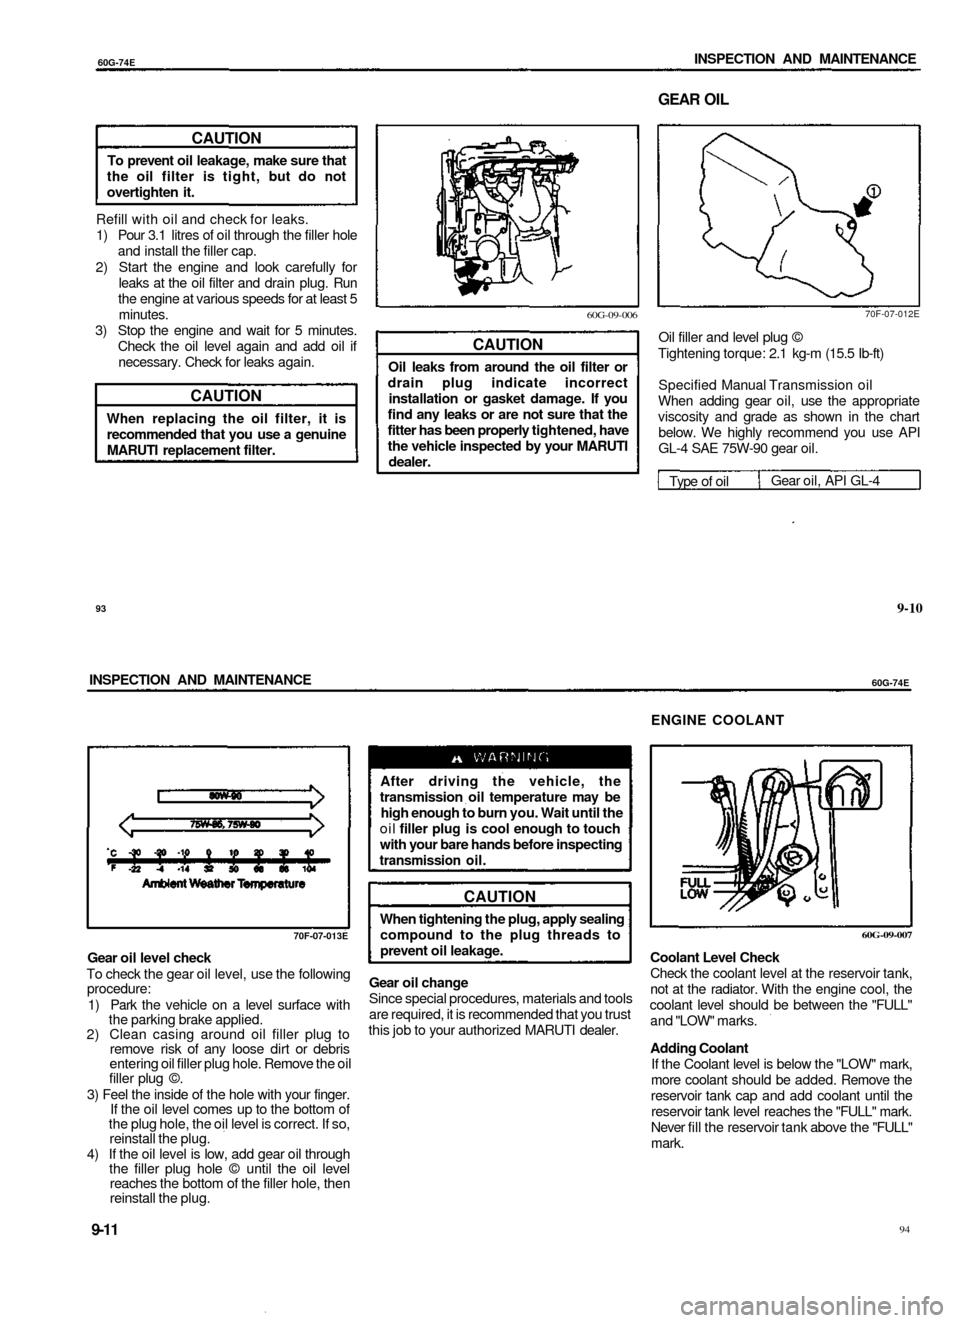 engine coolant suzuki baleno 1999 1 g owners manual